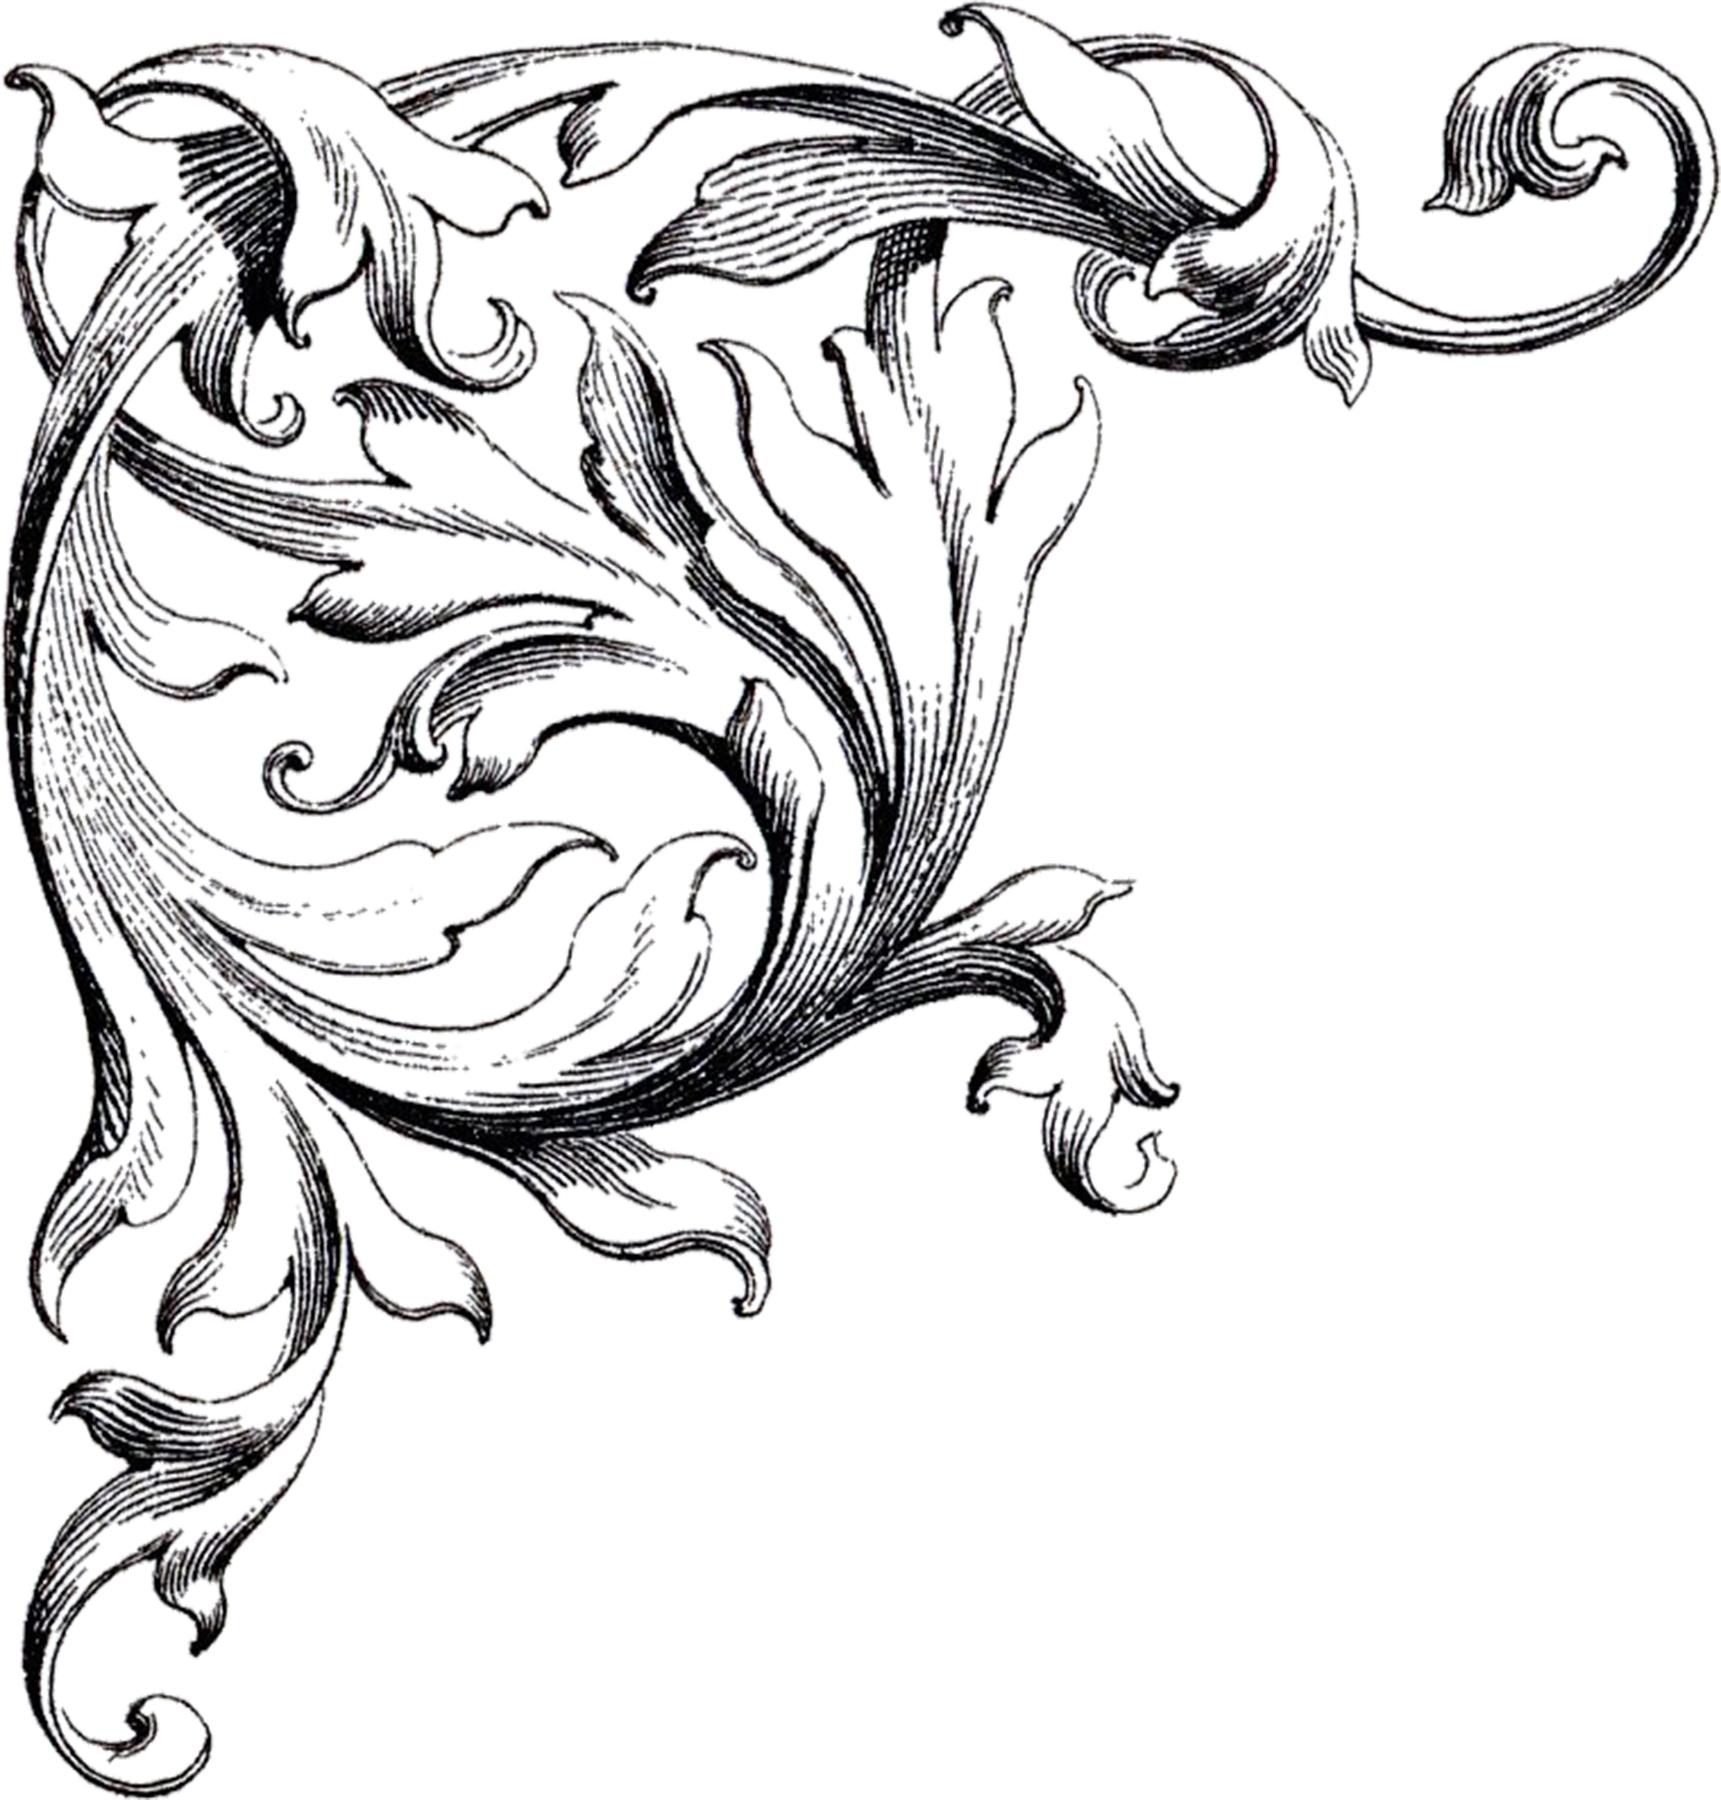 Free Wedding Clip Art Scrolls - The Graphics Fairy - Free Printable Wedding Scrolls